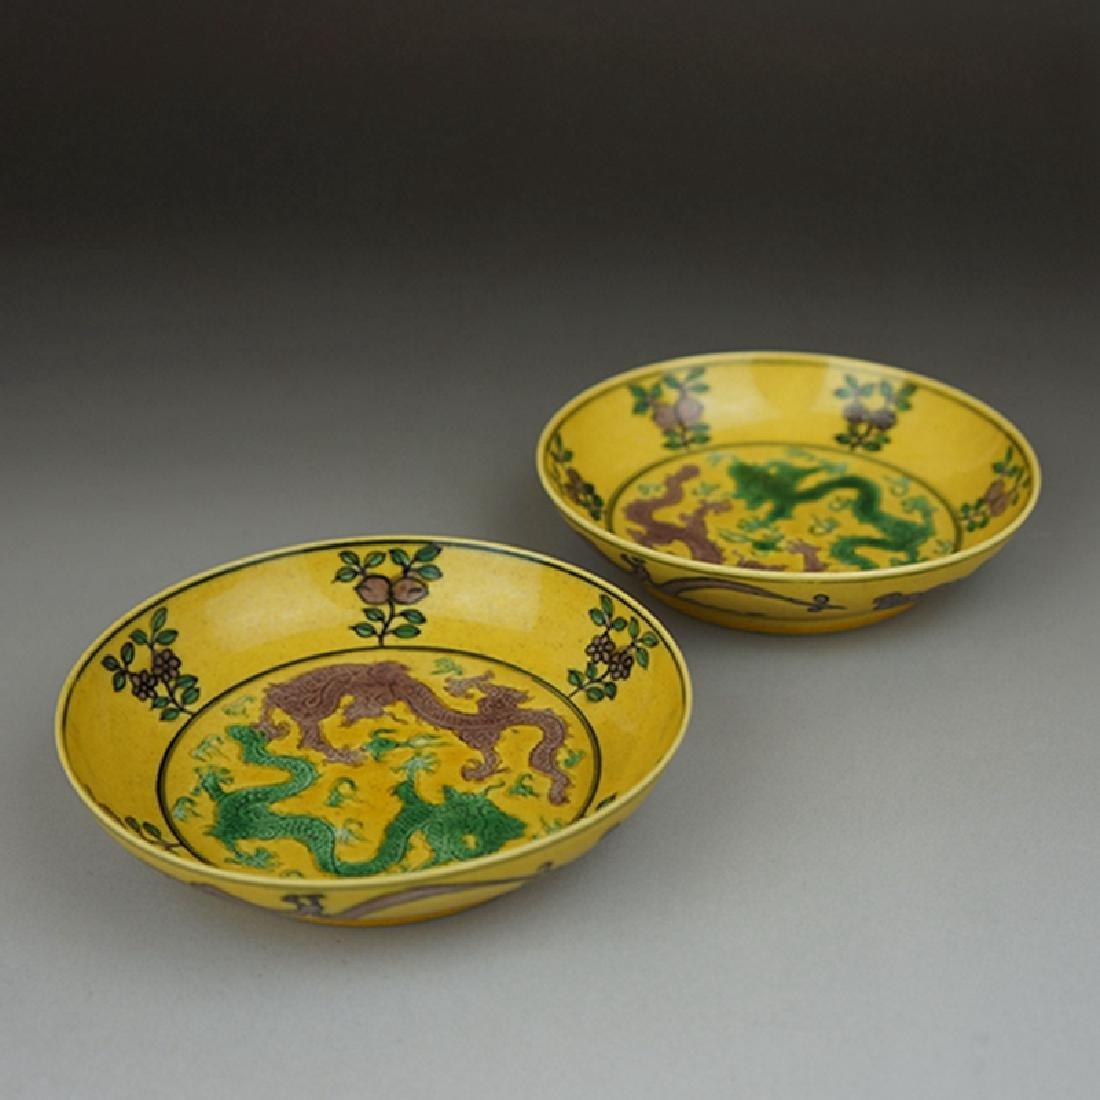 Pair Chinese Porcelain Plates Guangxu Mark